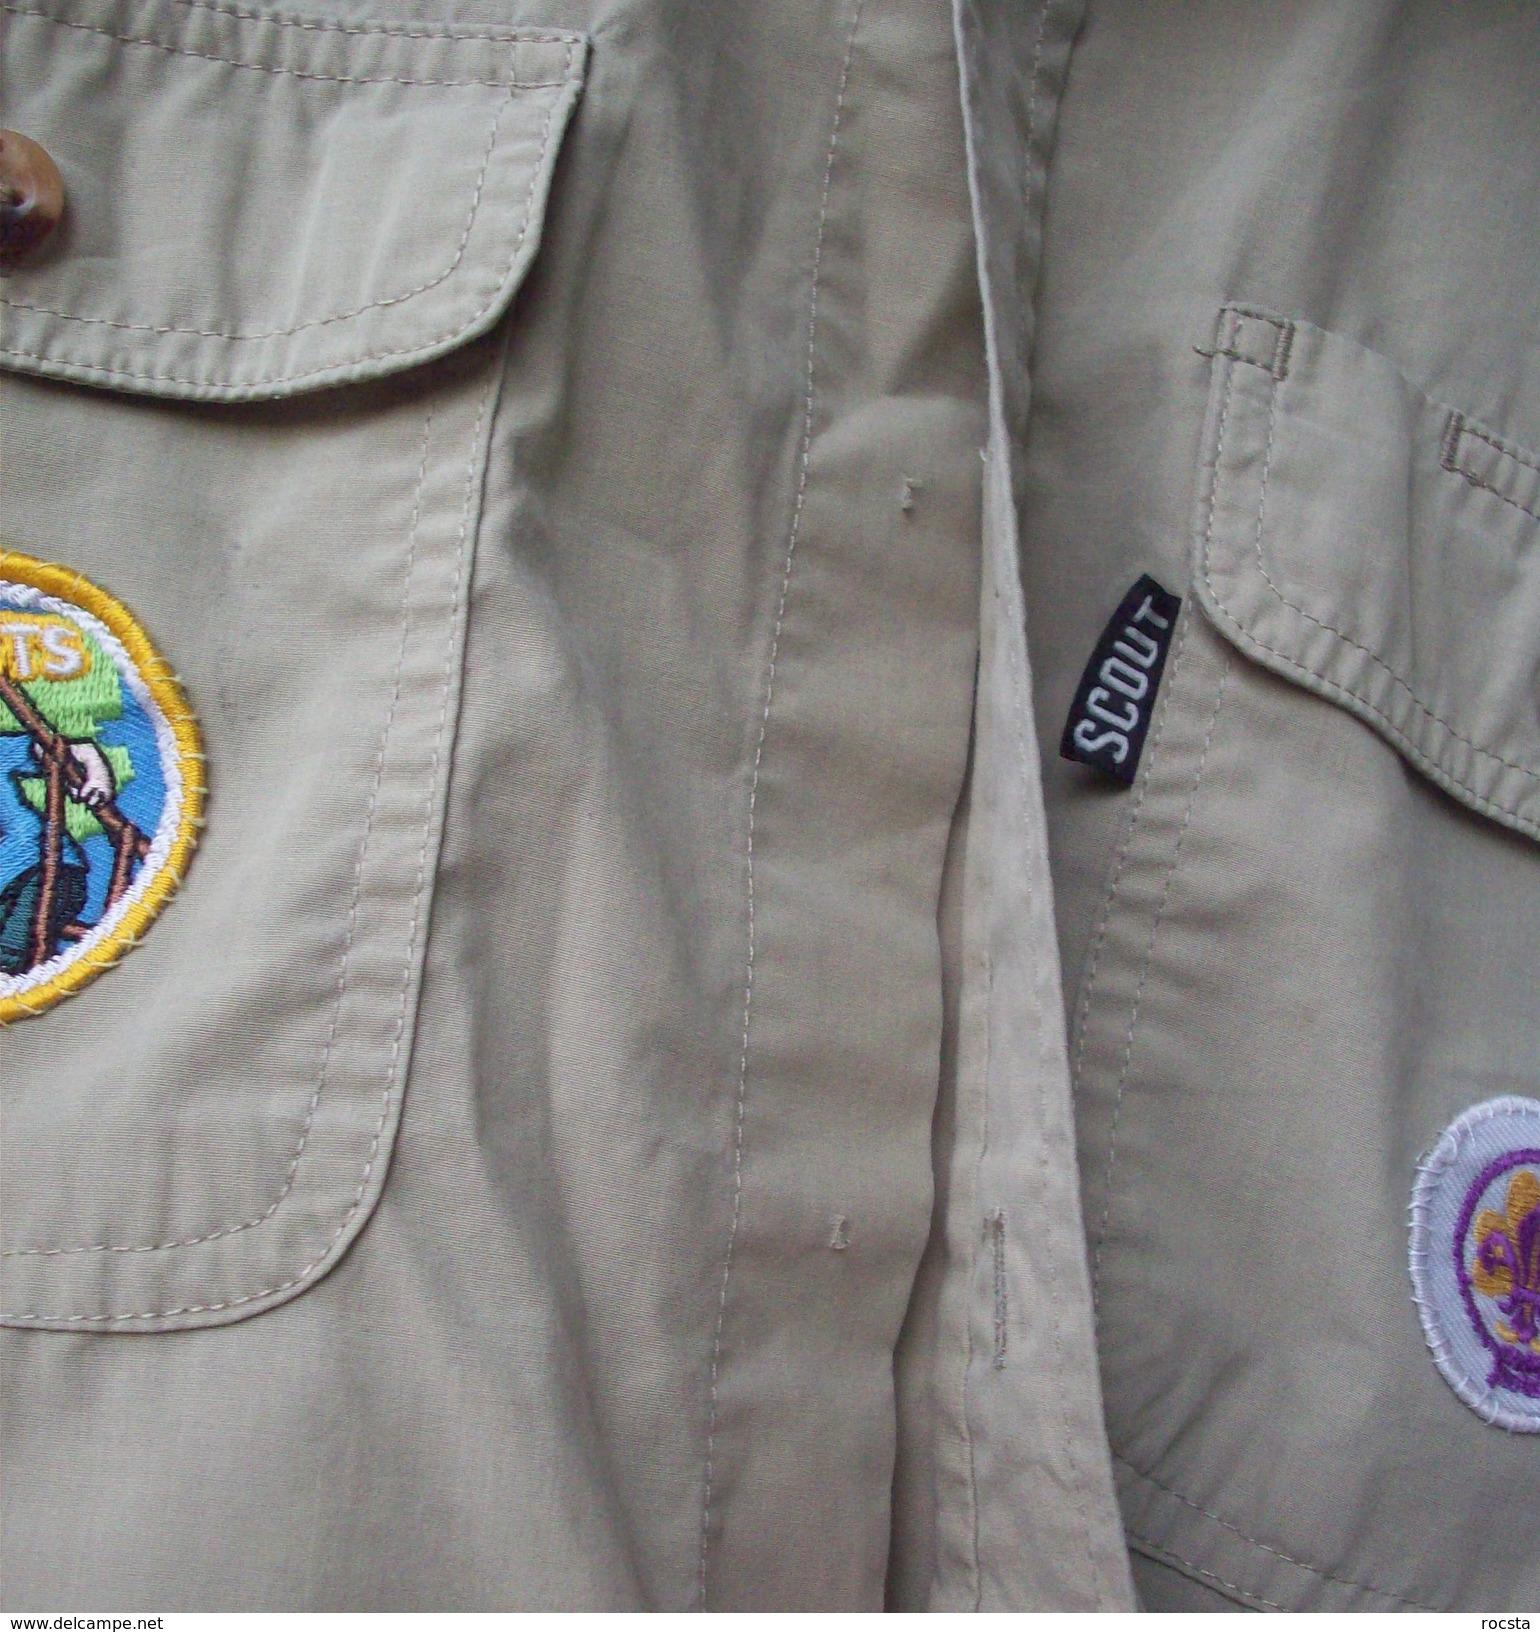 Netherlands Scout Shirt - 3 Patches - Padvinderij